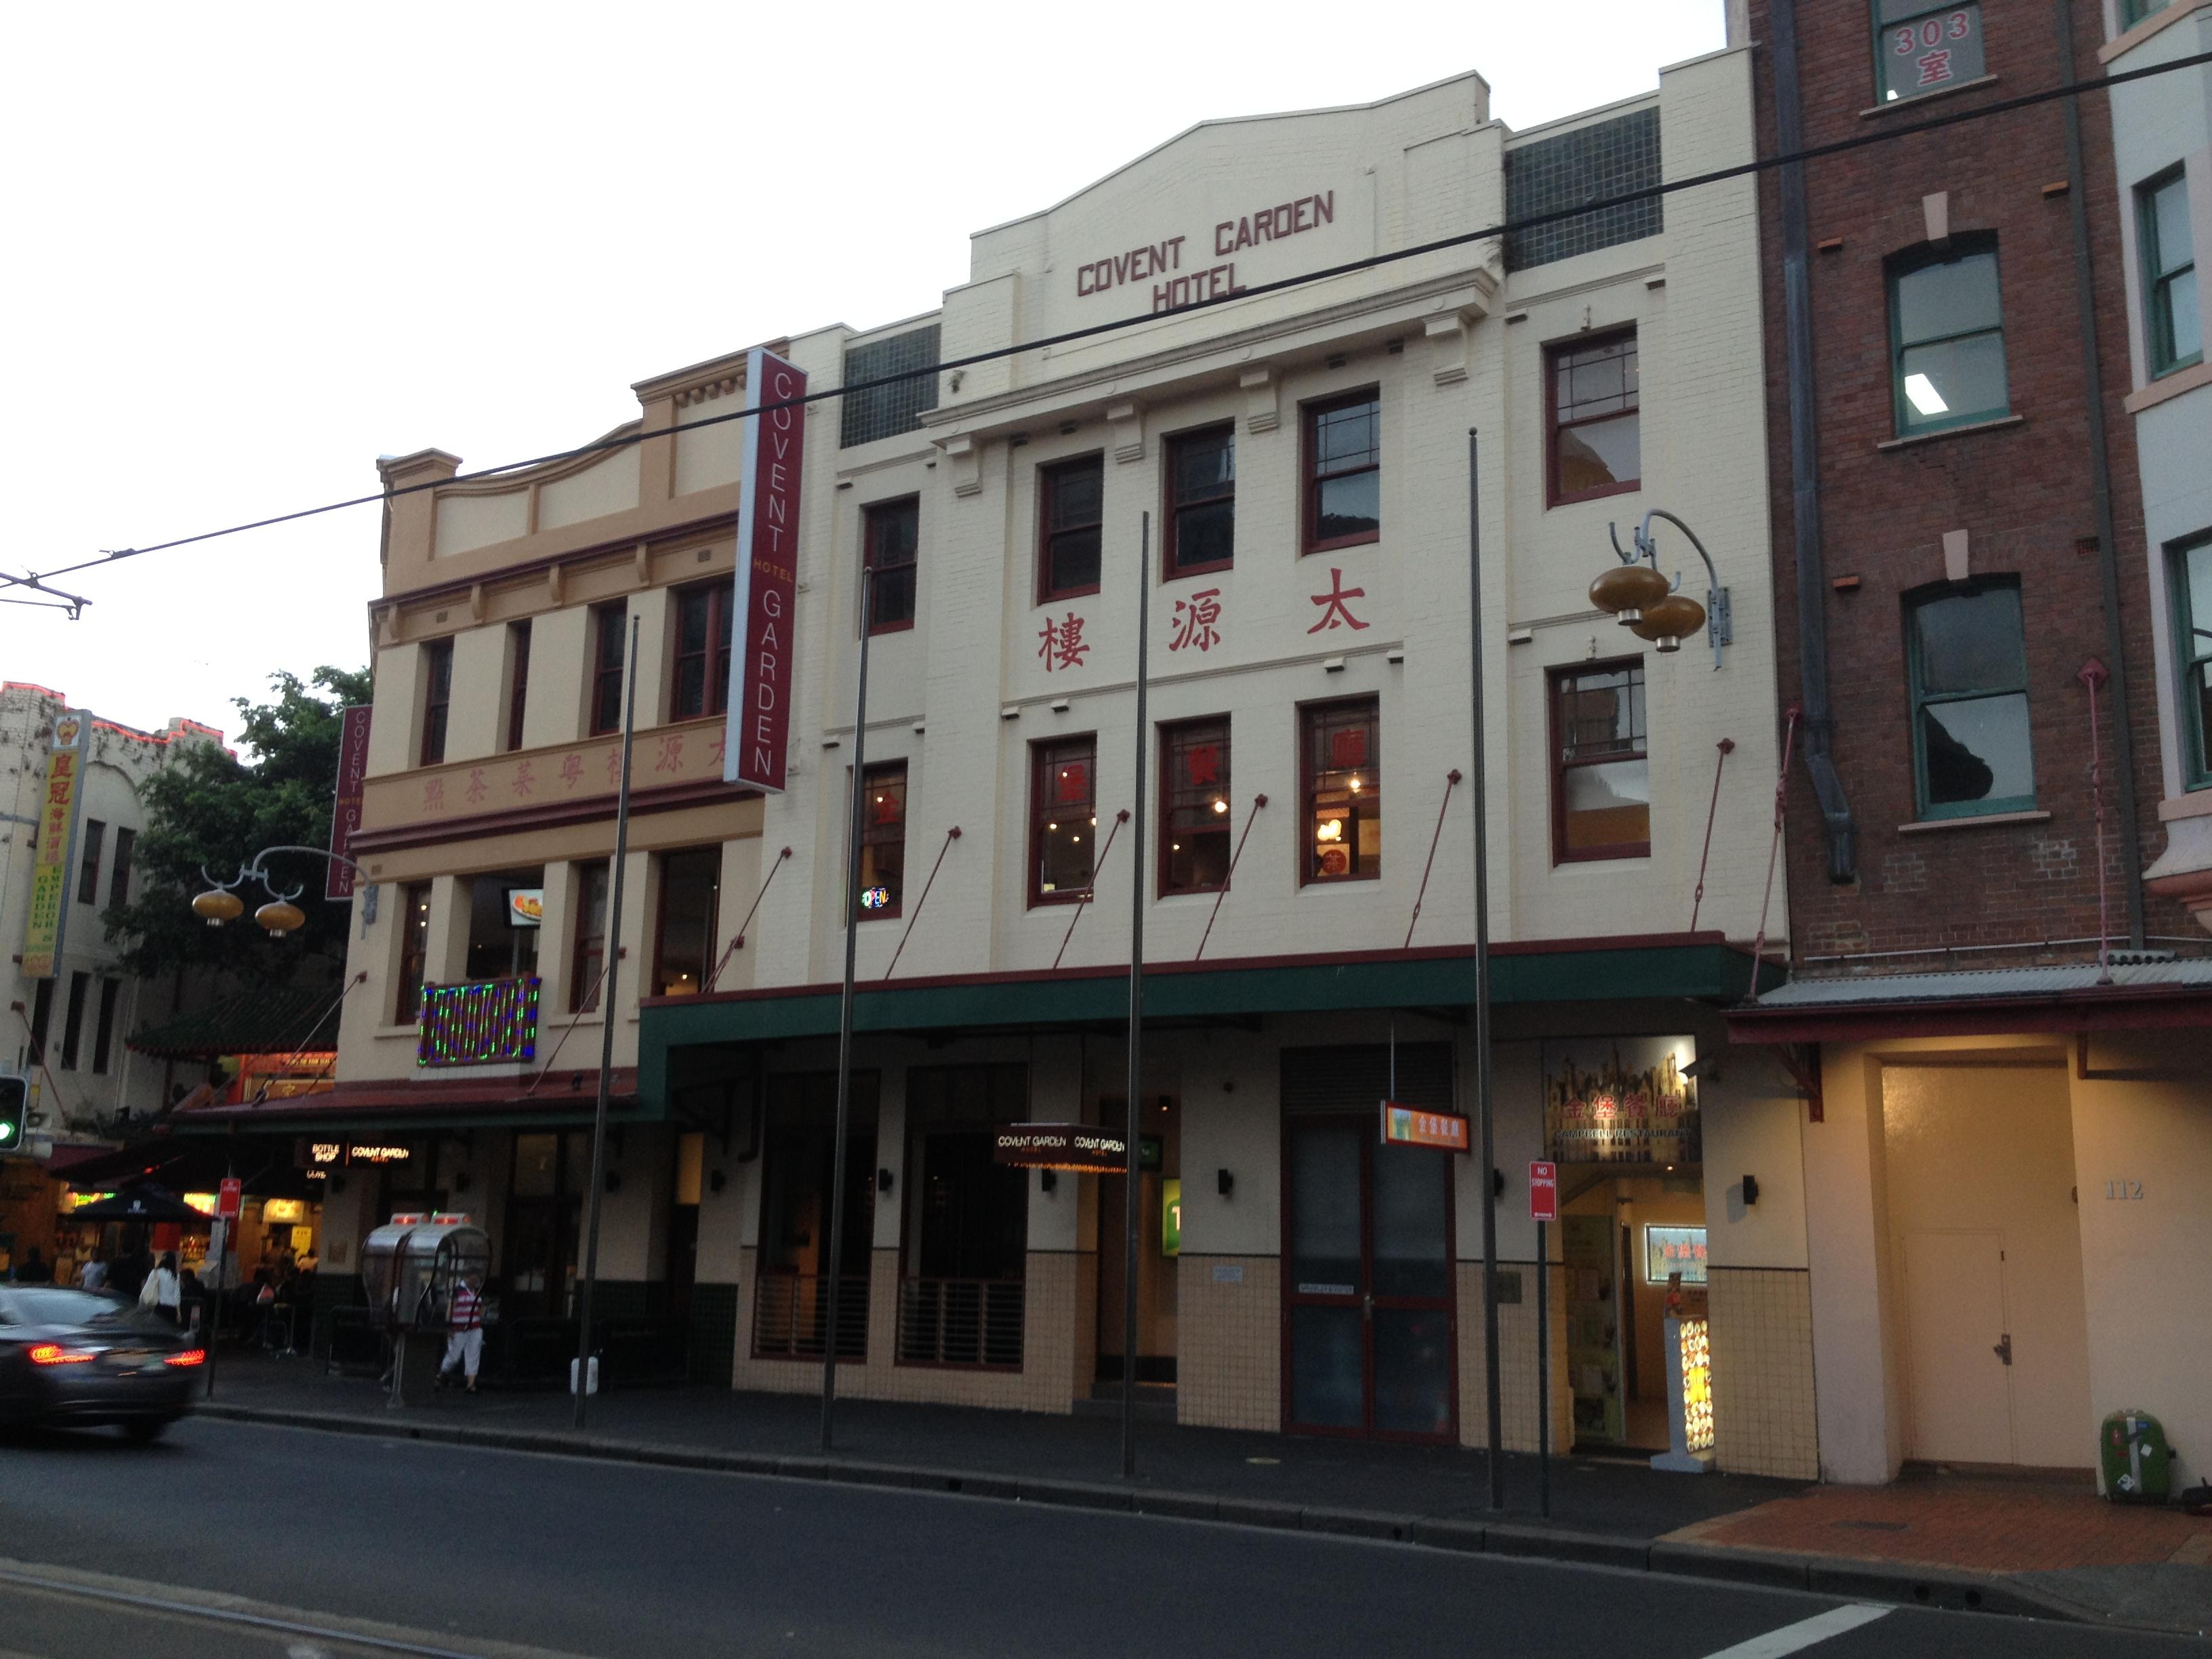 FileCovent Garden Hotel on Hay St in Sydneyjpg Wikimedia Commons